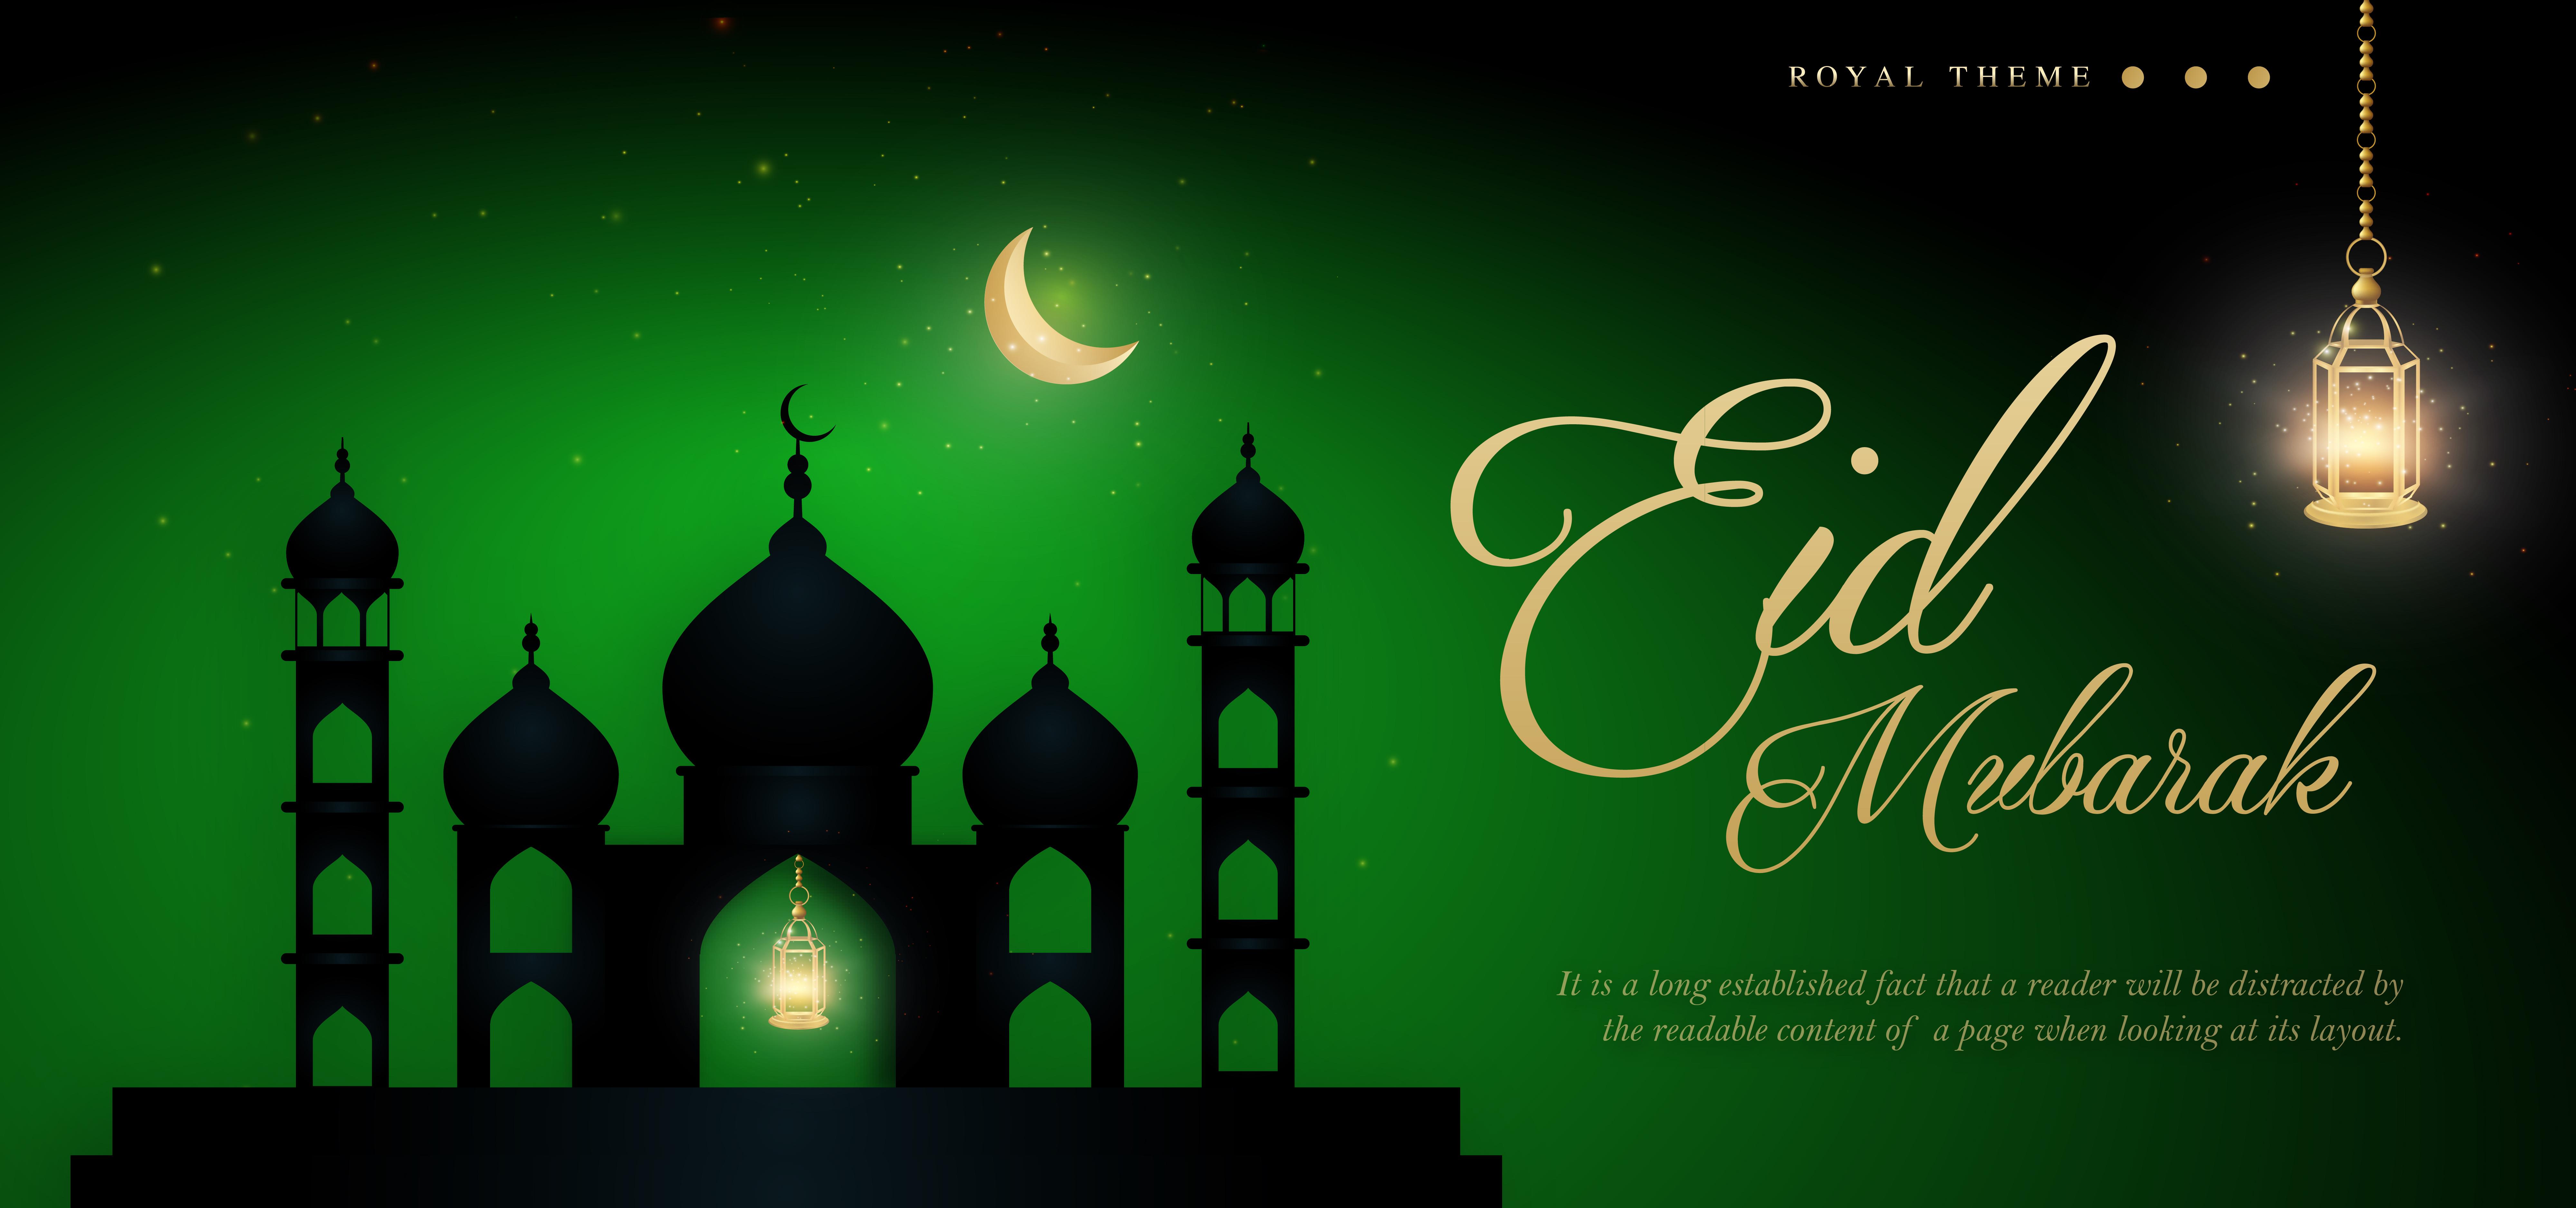 Eid Mubarak Green Royal Luxury Banner Background 685455 Vector Art At Vecteezy